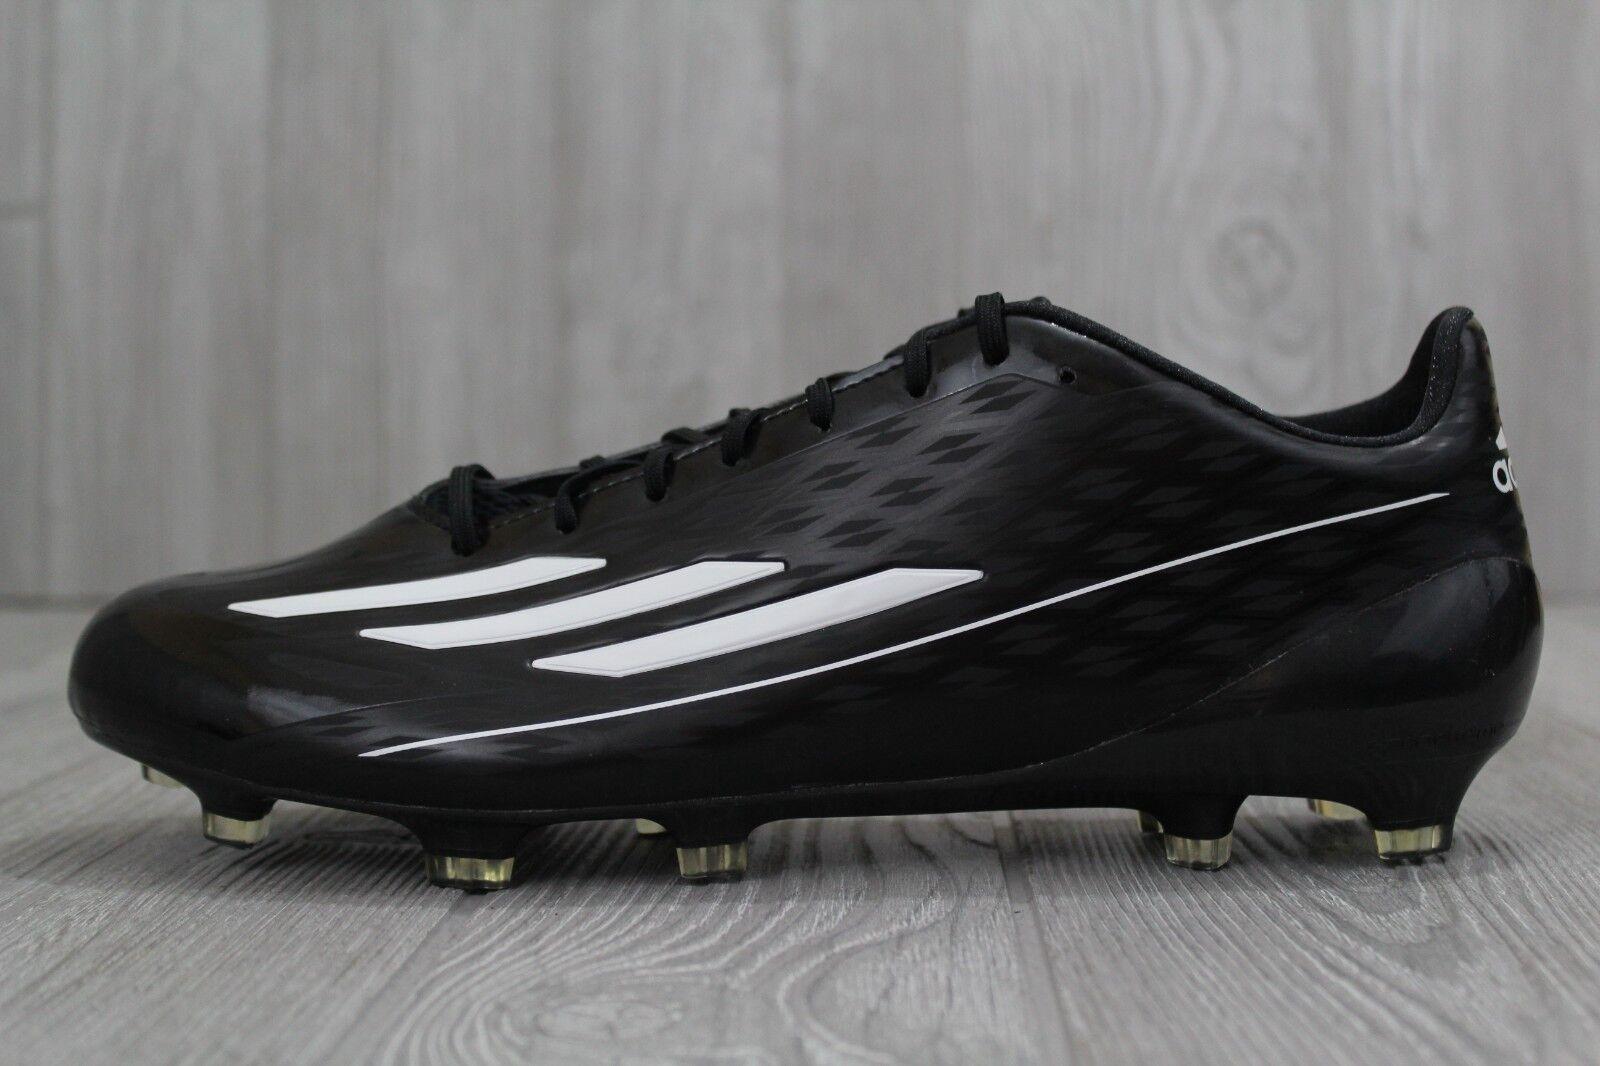 32 32 32 New Adidas Football Cleats AH1204 Black White Men's Size 11.5 bca2e7